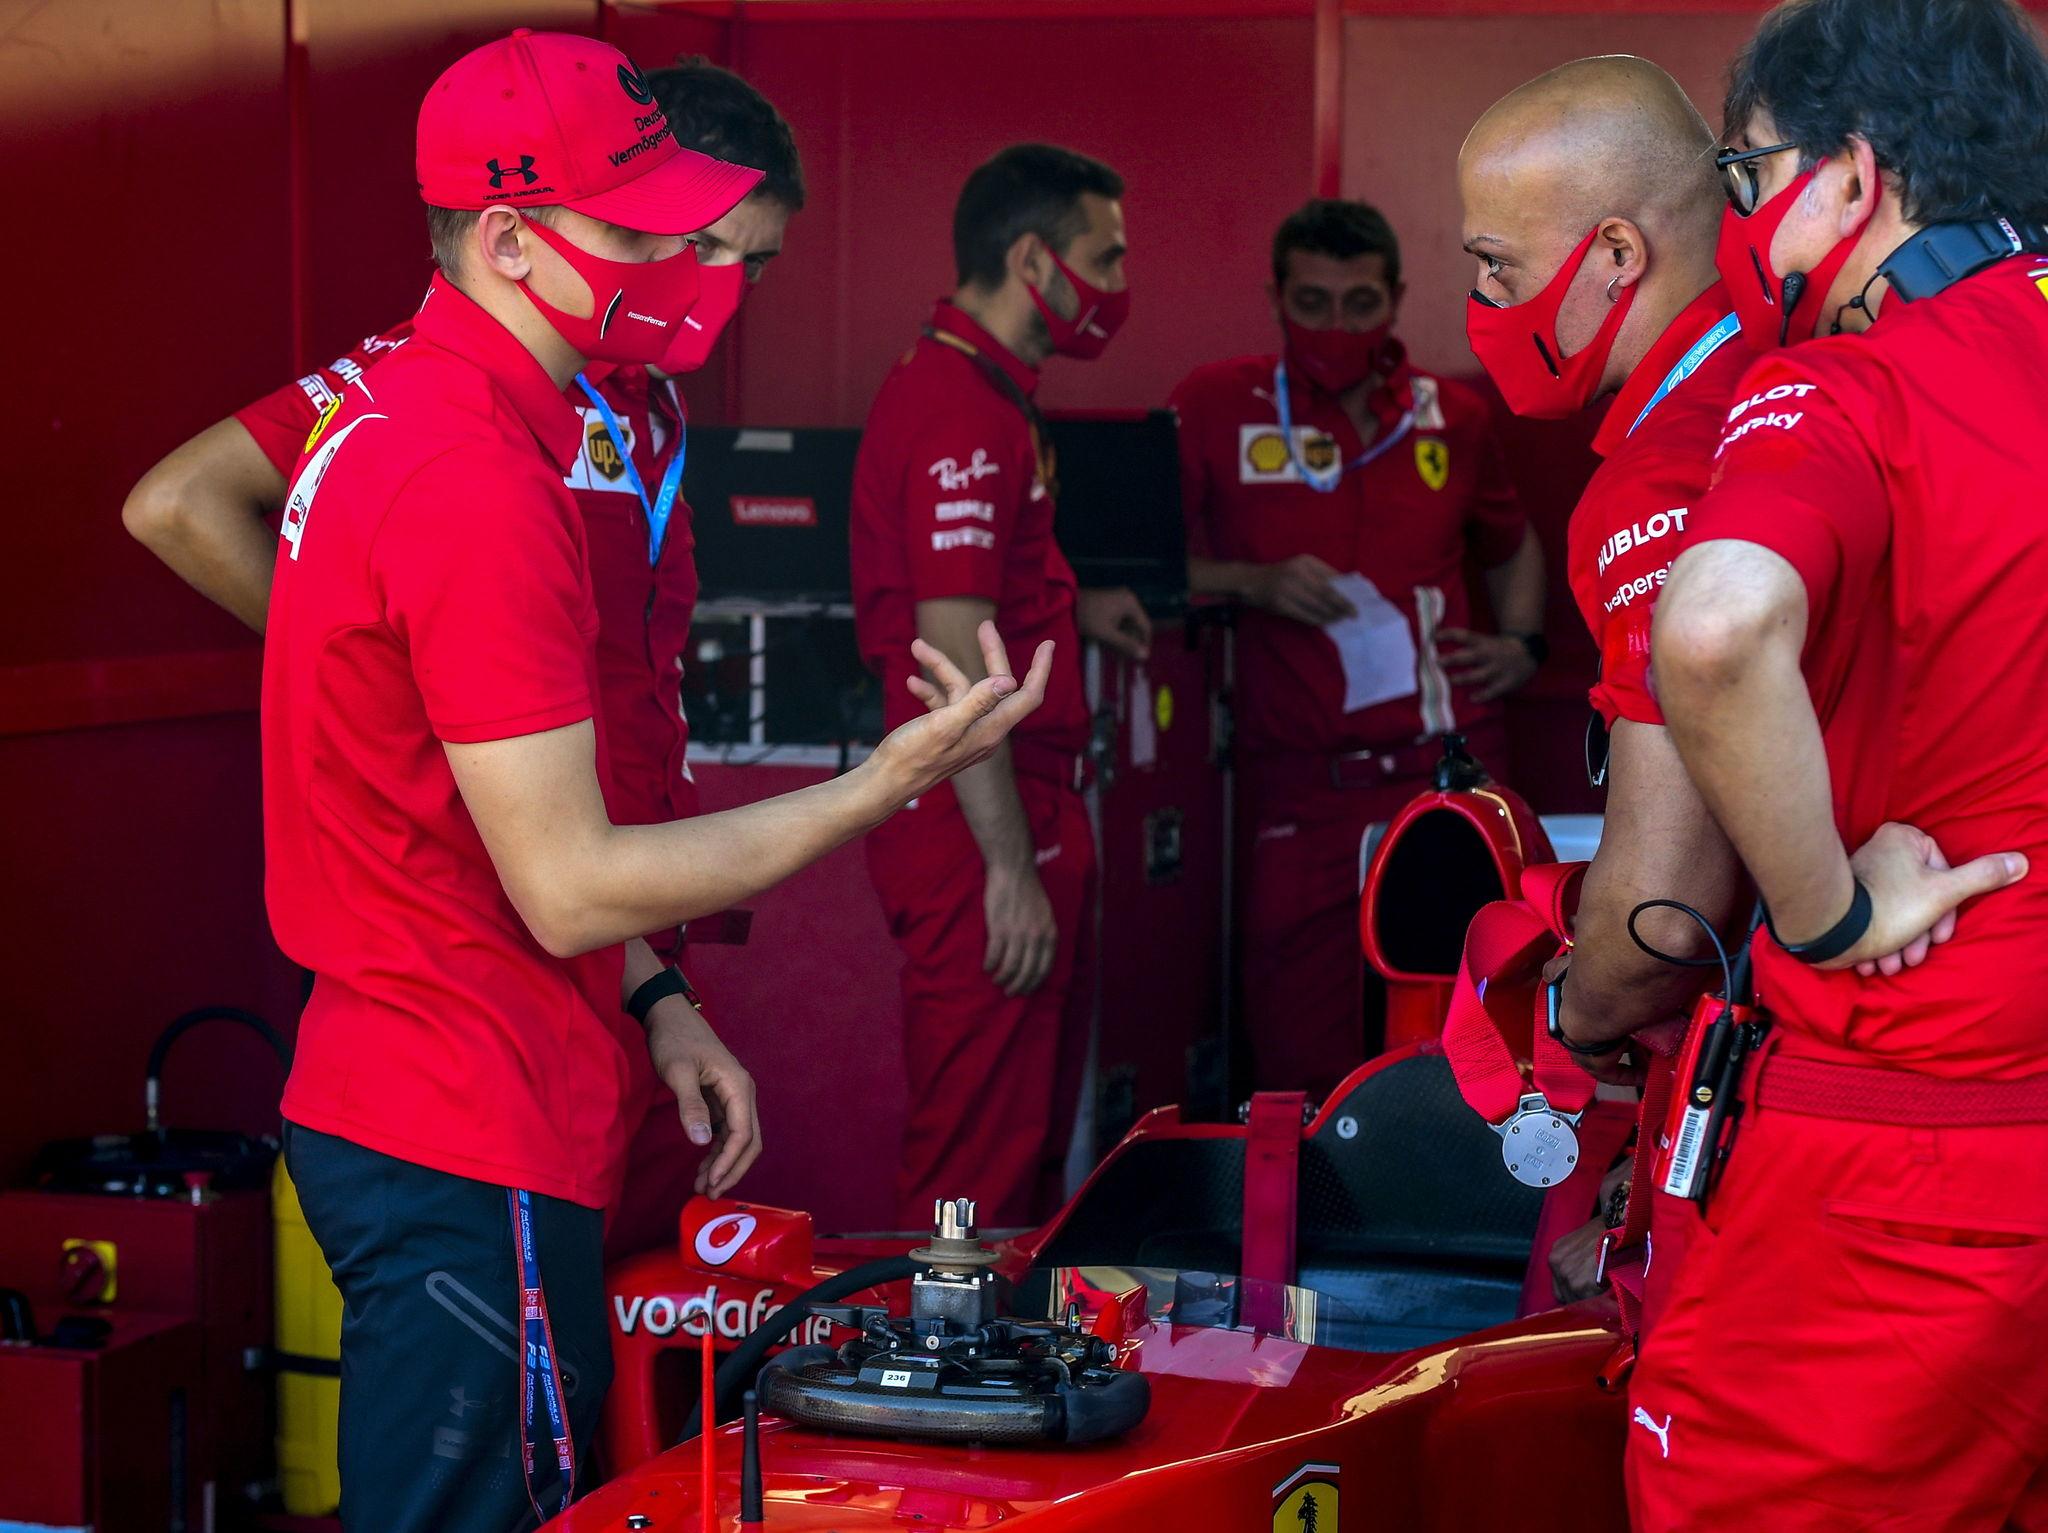 Mugello (Italy), 13/09/2020.- Former Ferrari driver Michael lt;HIT gt;Schumacher lt;/HIT gt;s son lt;HIT gt;Mick lt;/HIT gt; lt;HIT gt;Schumacher lt;/HIT gt; (L) talks with the Ferrari engineers and staff before the race ahead of the Formula One Grand Prix of Tuscany at the race track in Mugello, Italy 13 September 2020. (Fórmula Uno, Italia) EFE/EPA/Jennifer Lorenzini / Pool